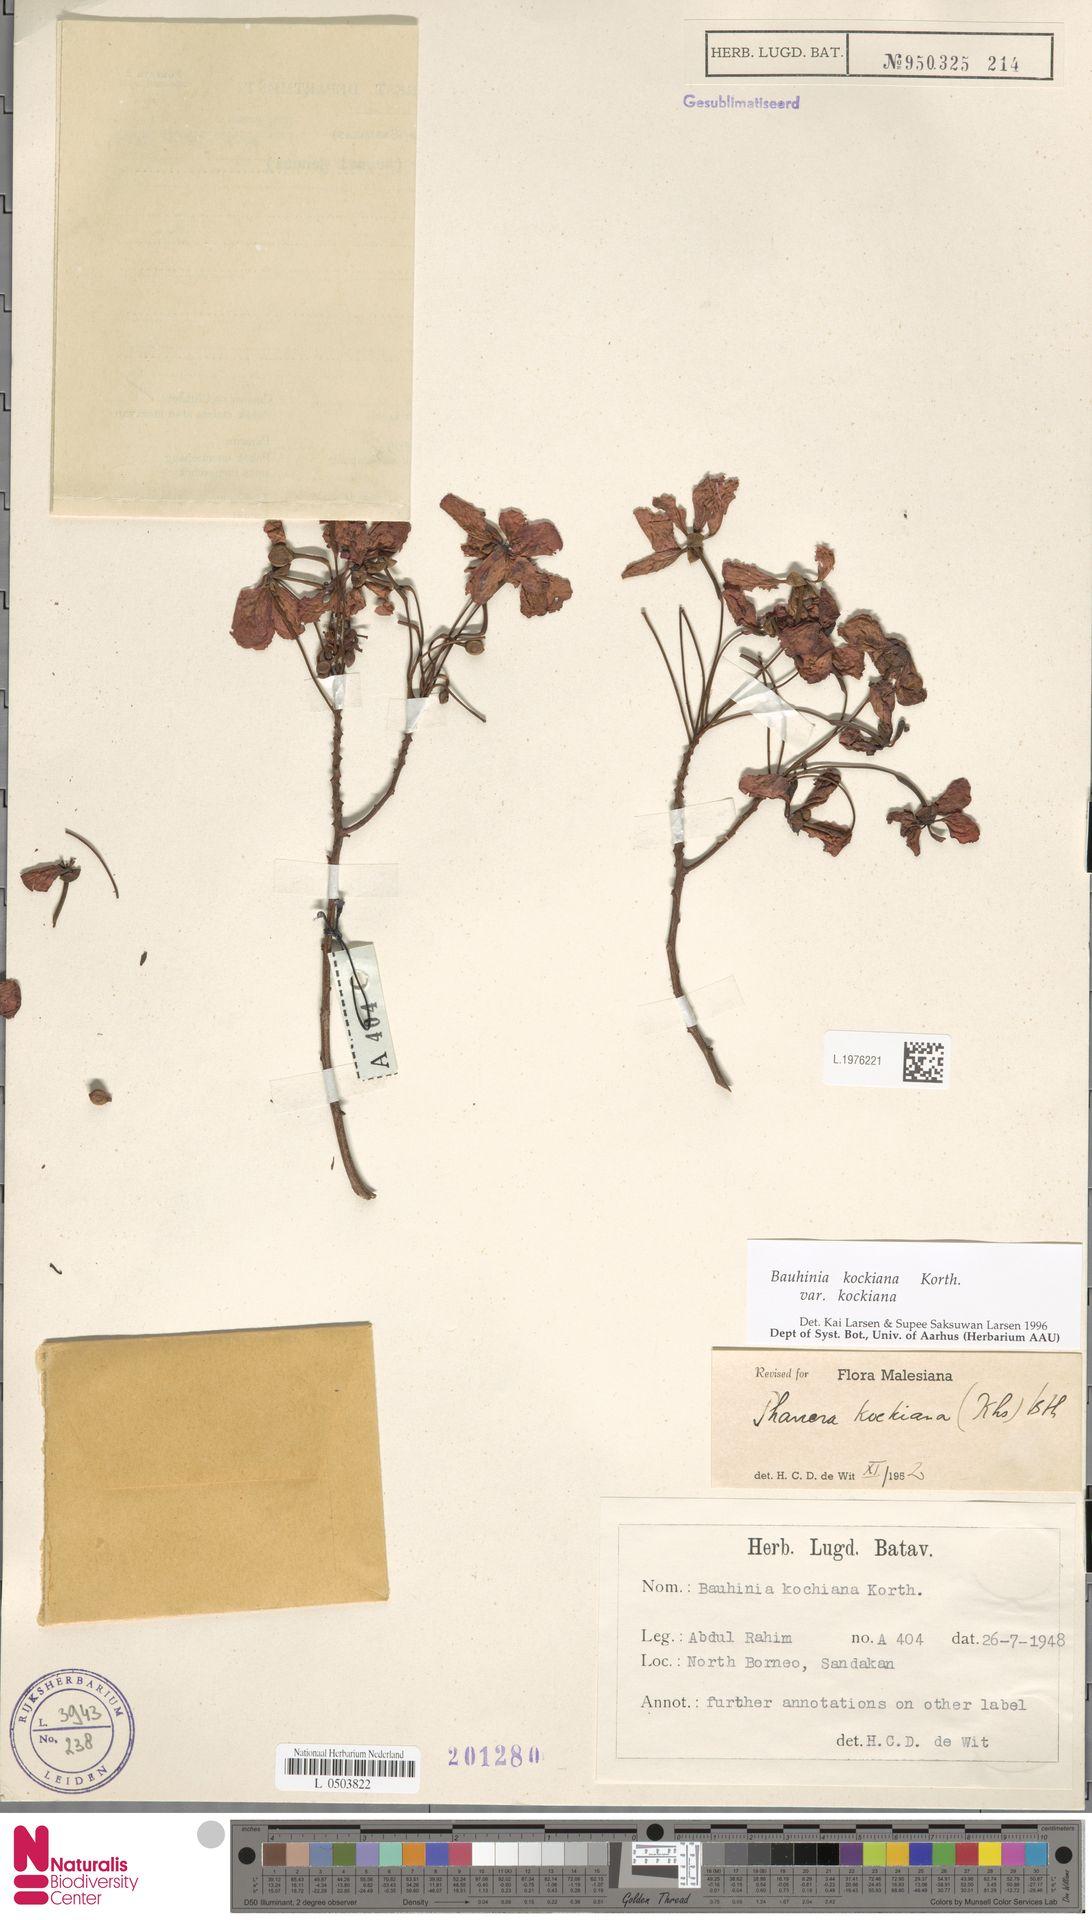 L.1976221 | Bauhinia kockiana var. kockiana